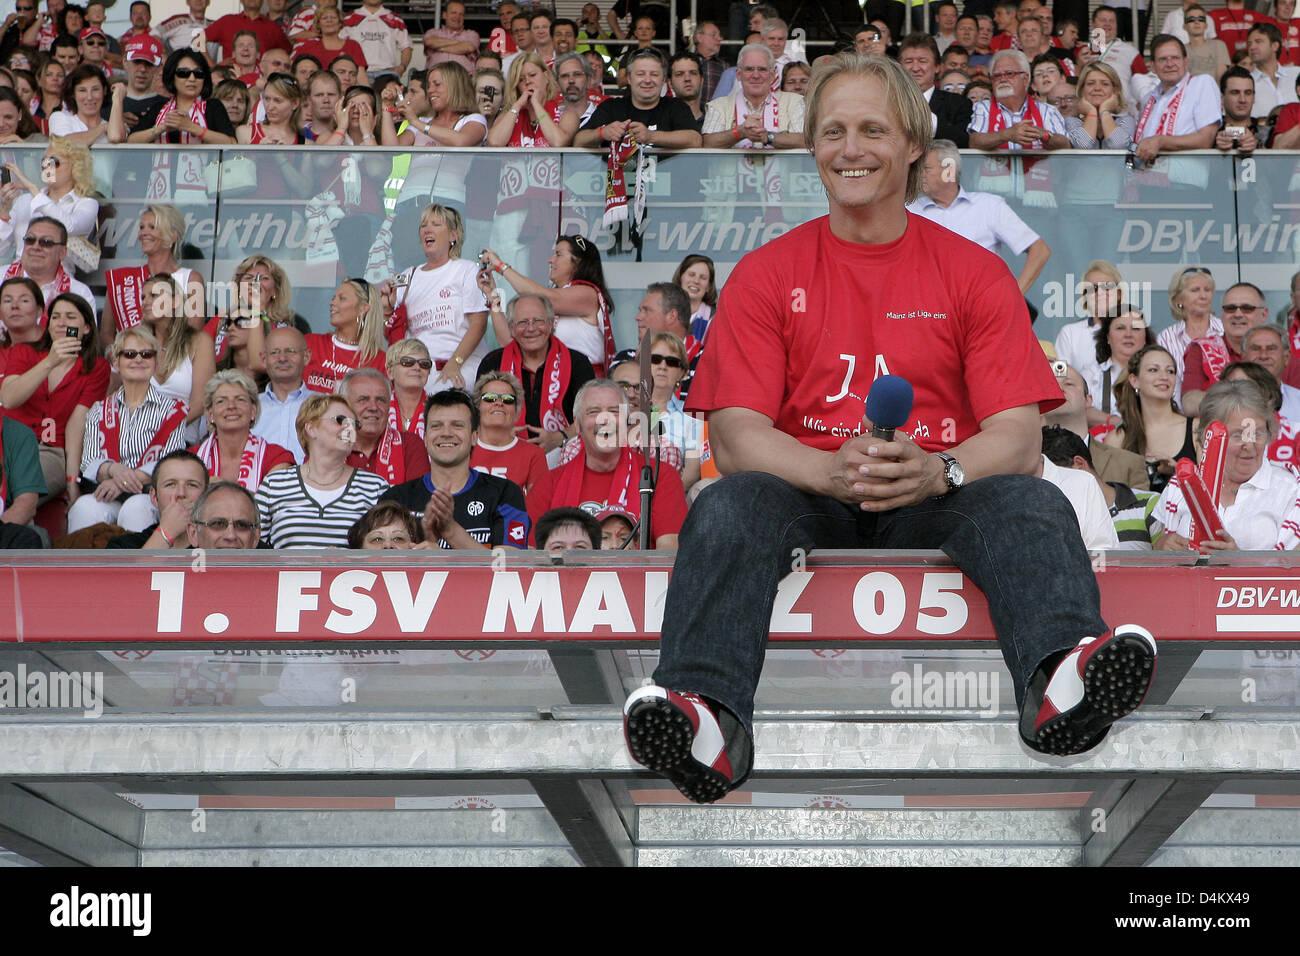 Joern Andersen, Mainz?s head coach, celebrates after the Bundesliga second division soccer match FSV Mainz 05 vs - Stock Image